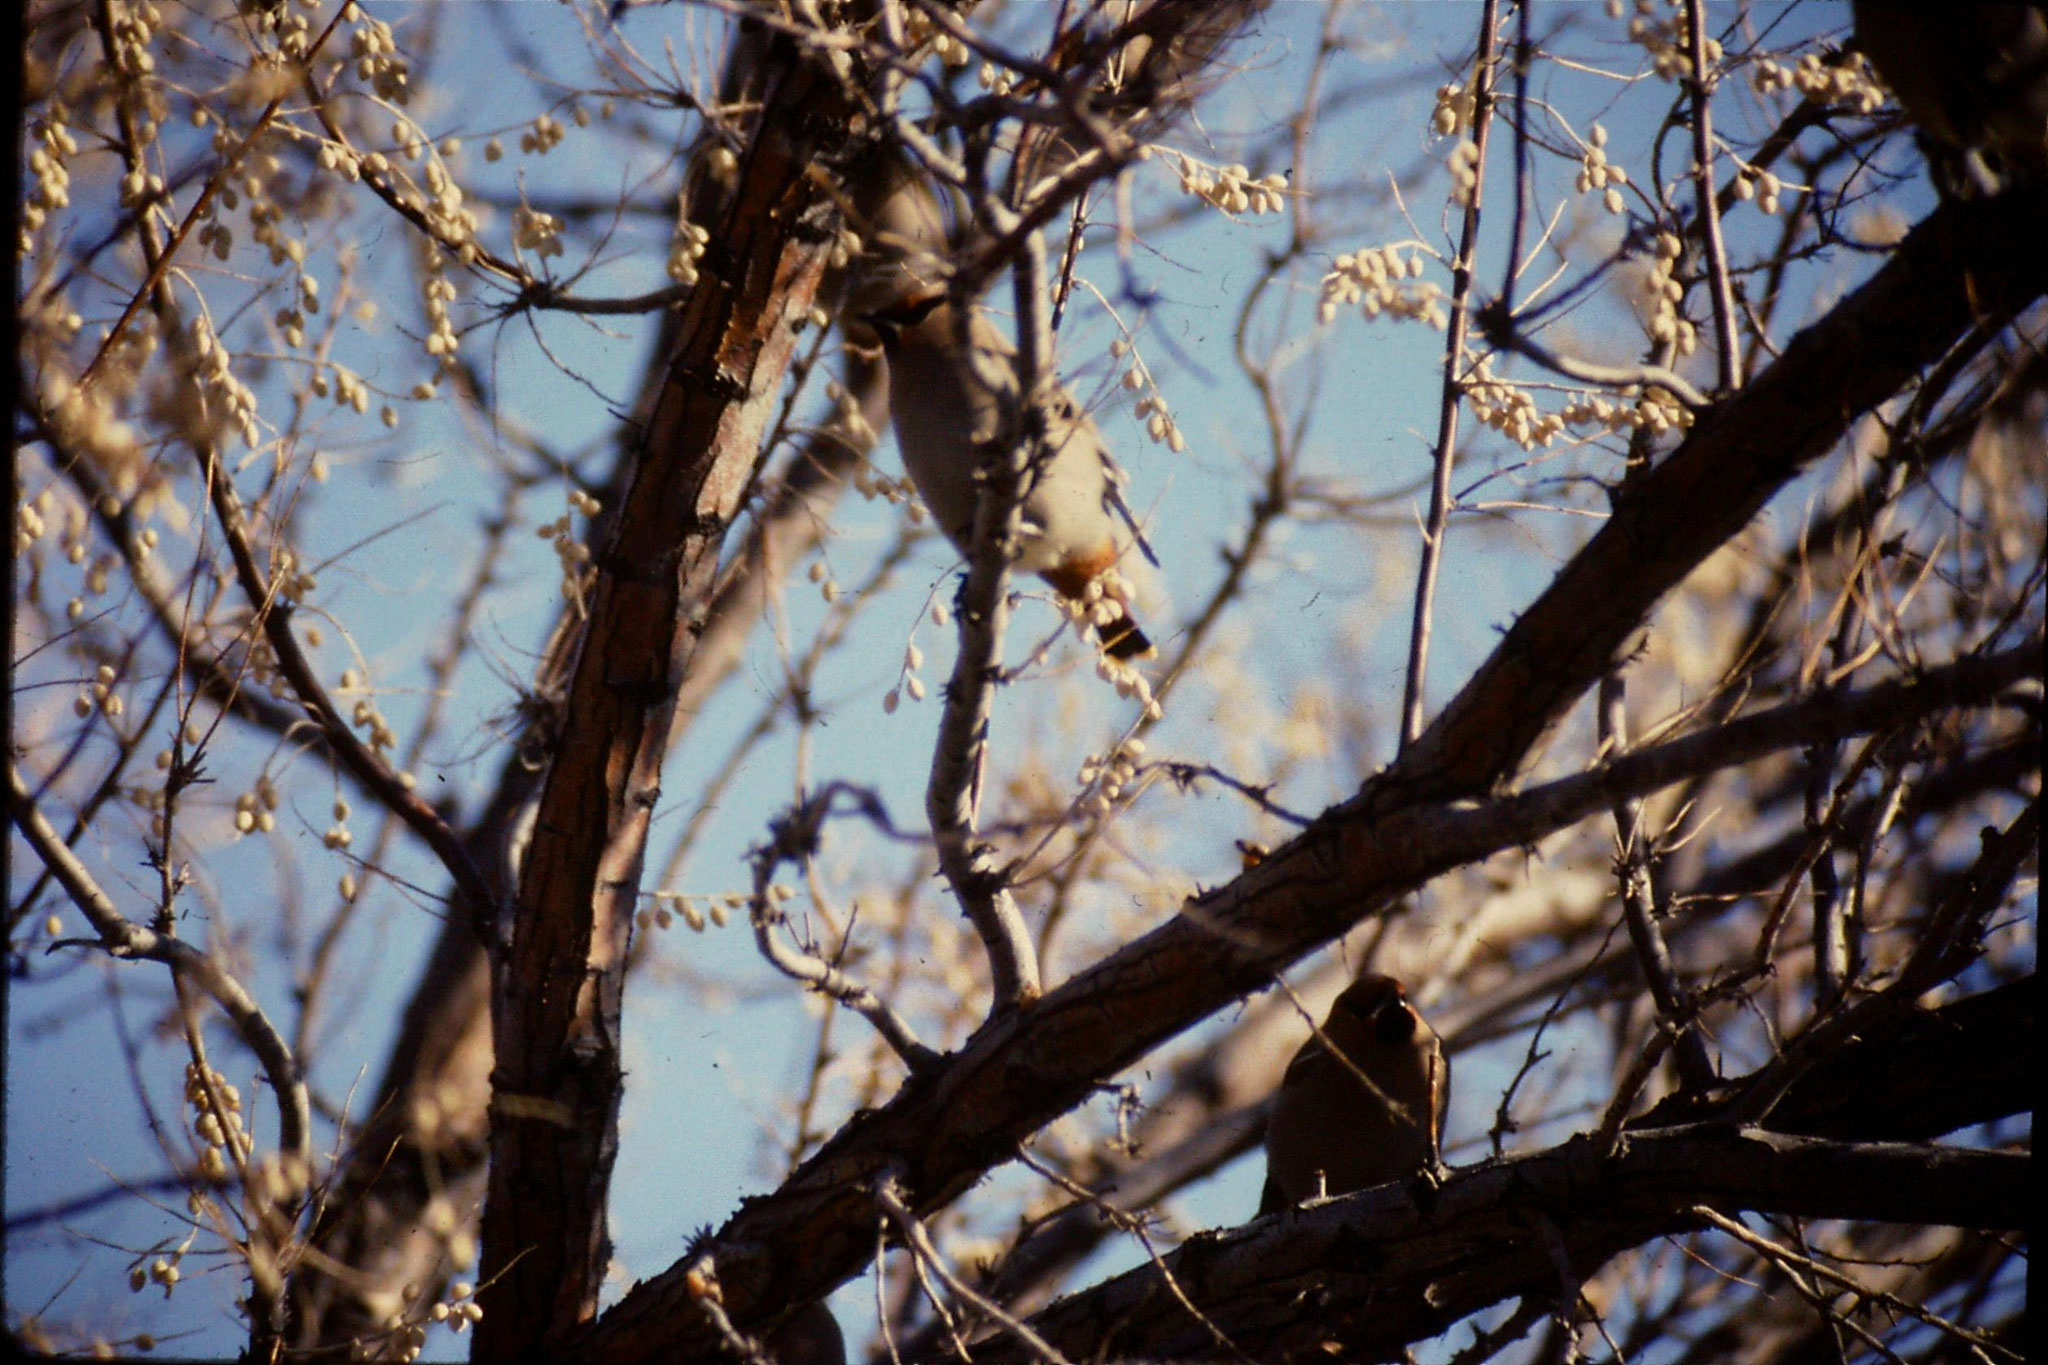 24/1/1991: 30: Bruneau Sand Dunes: Bavarian waxwings